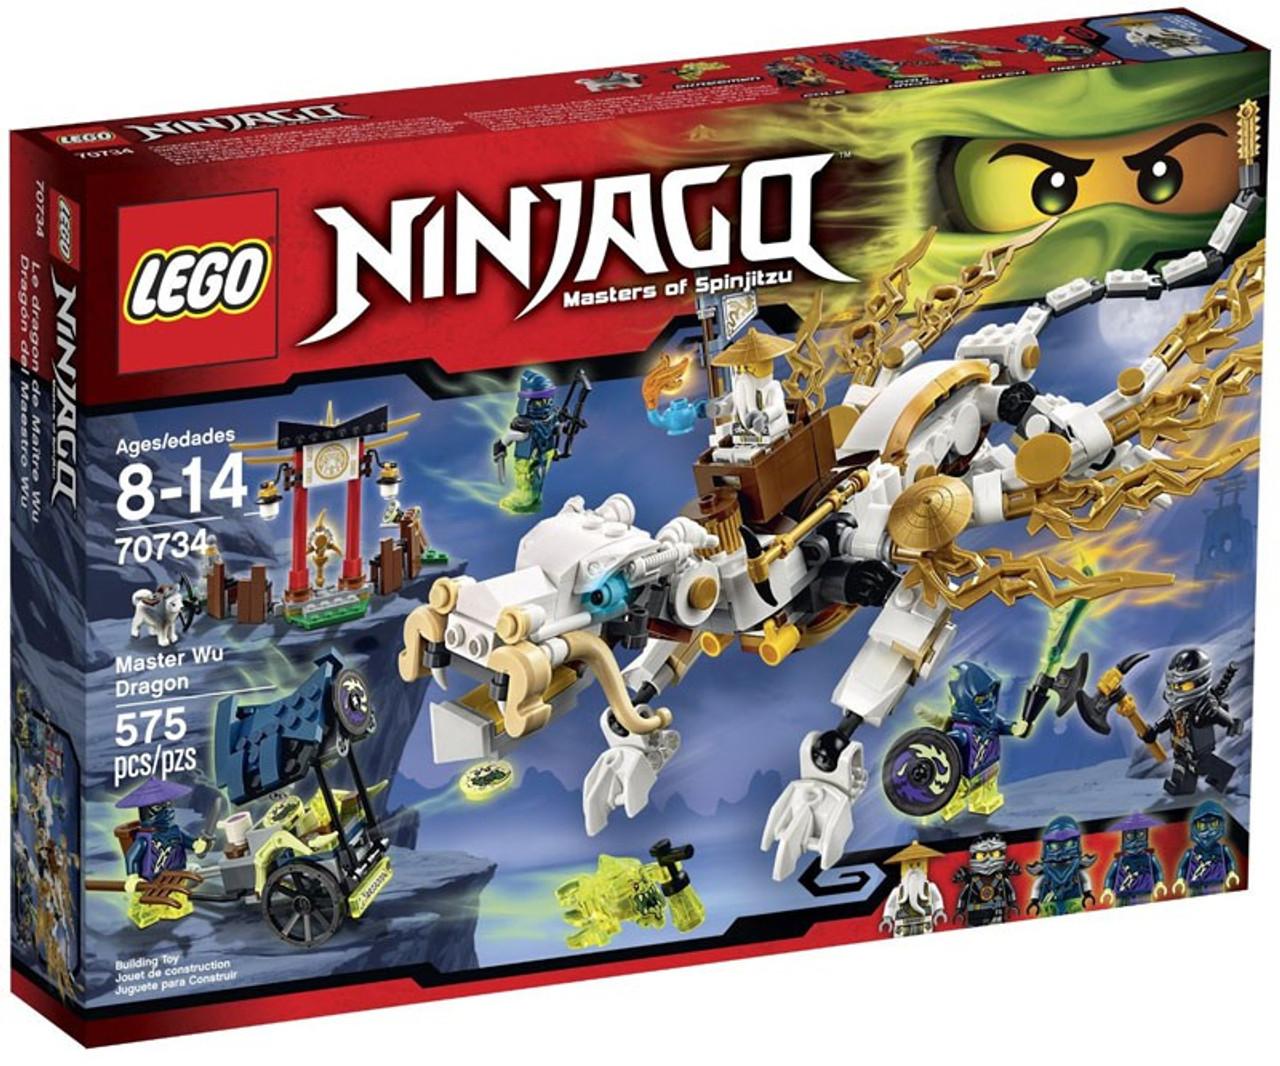 LEGO Ninjago Master Wu Dragon Set 70734 - ToyWiz